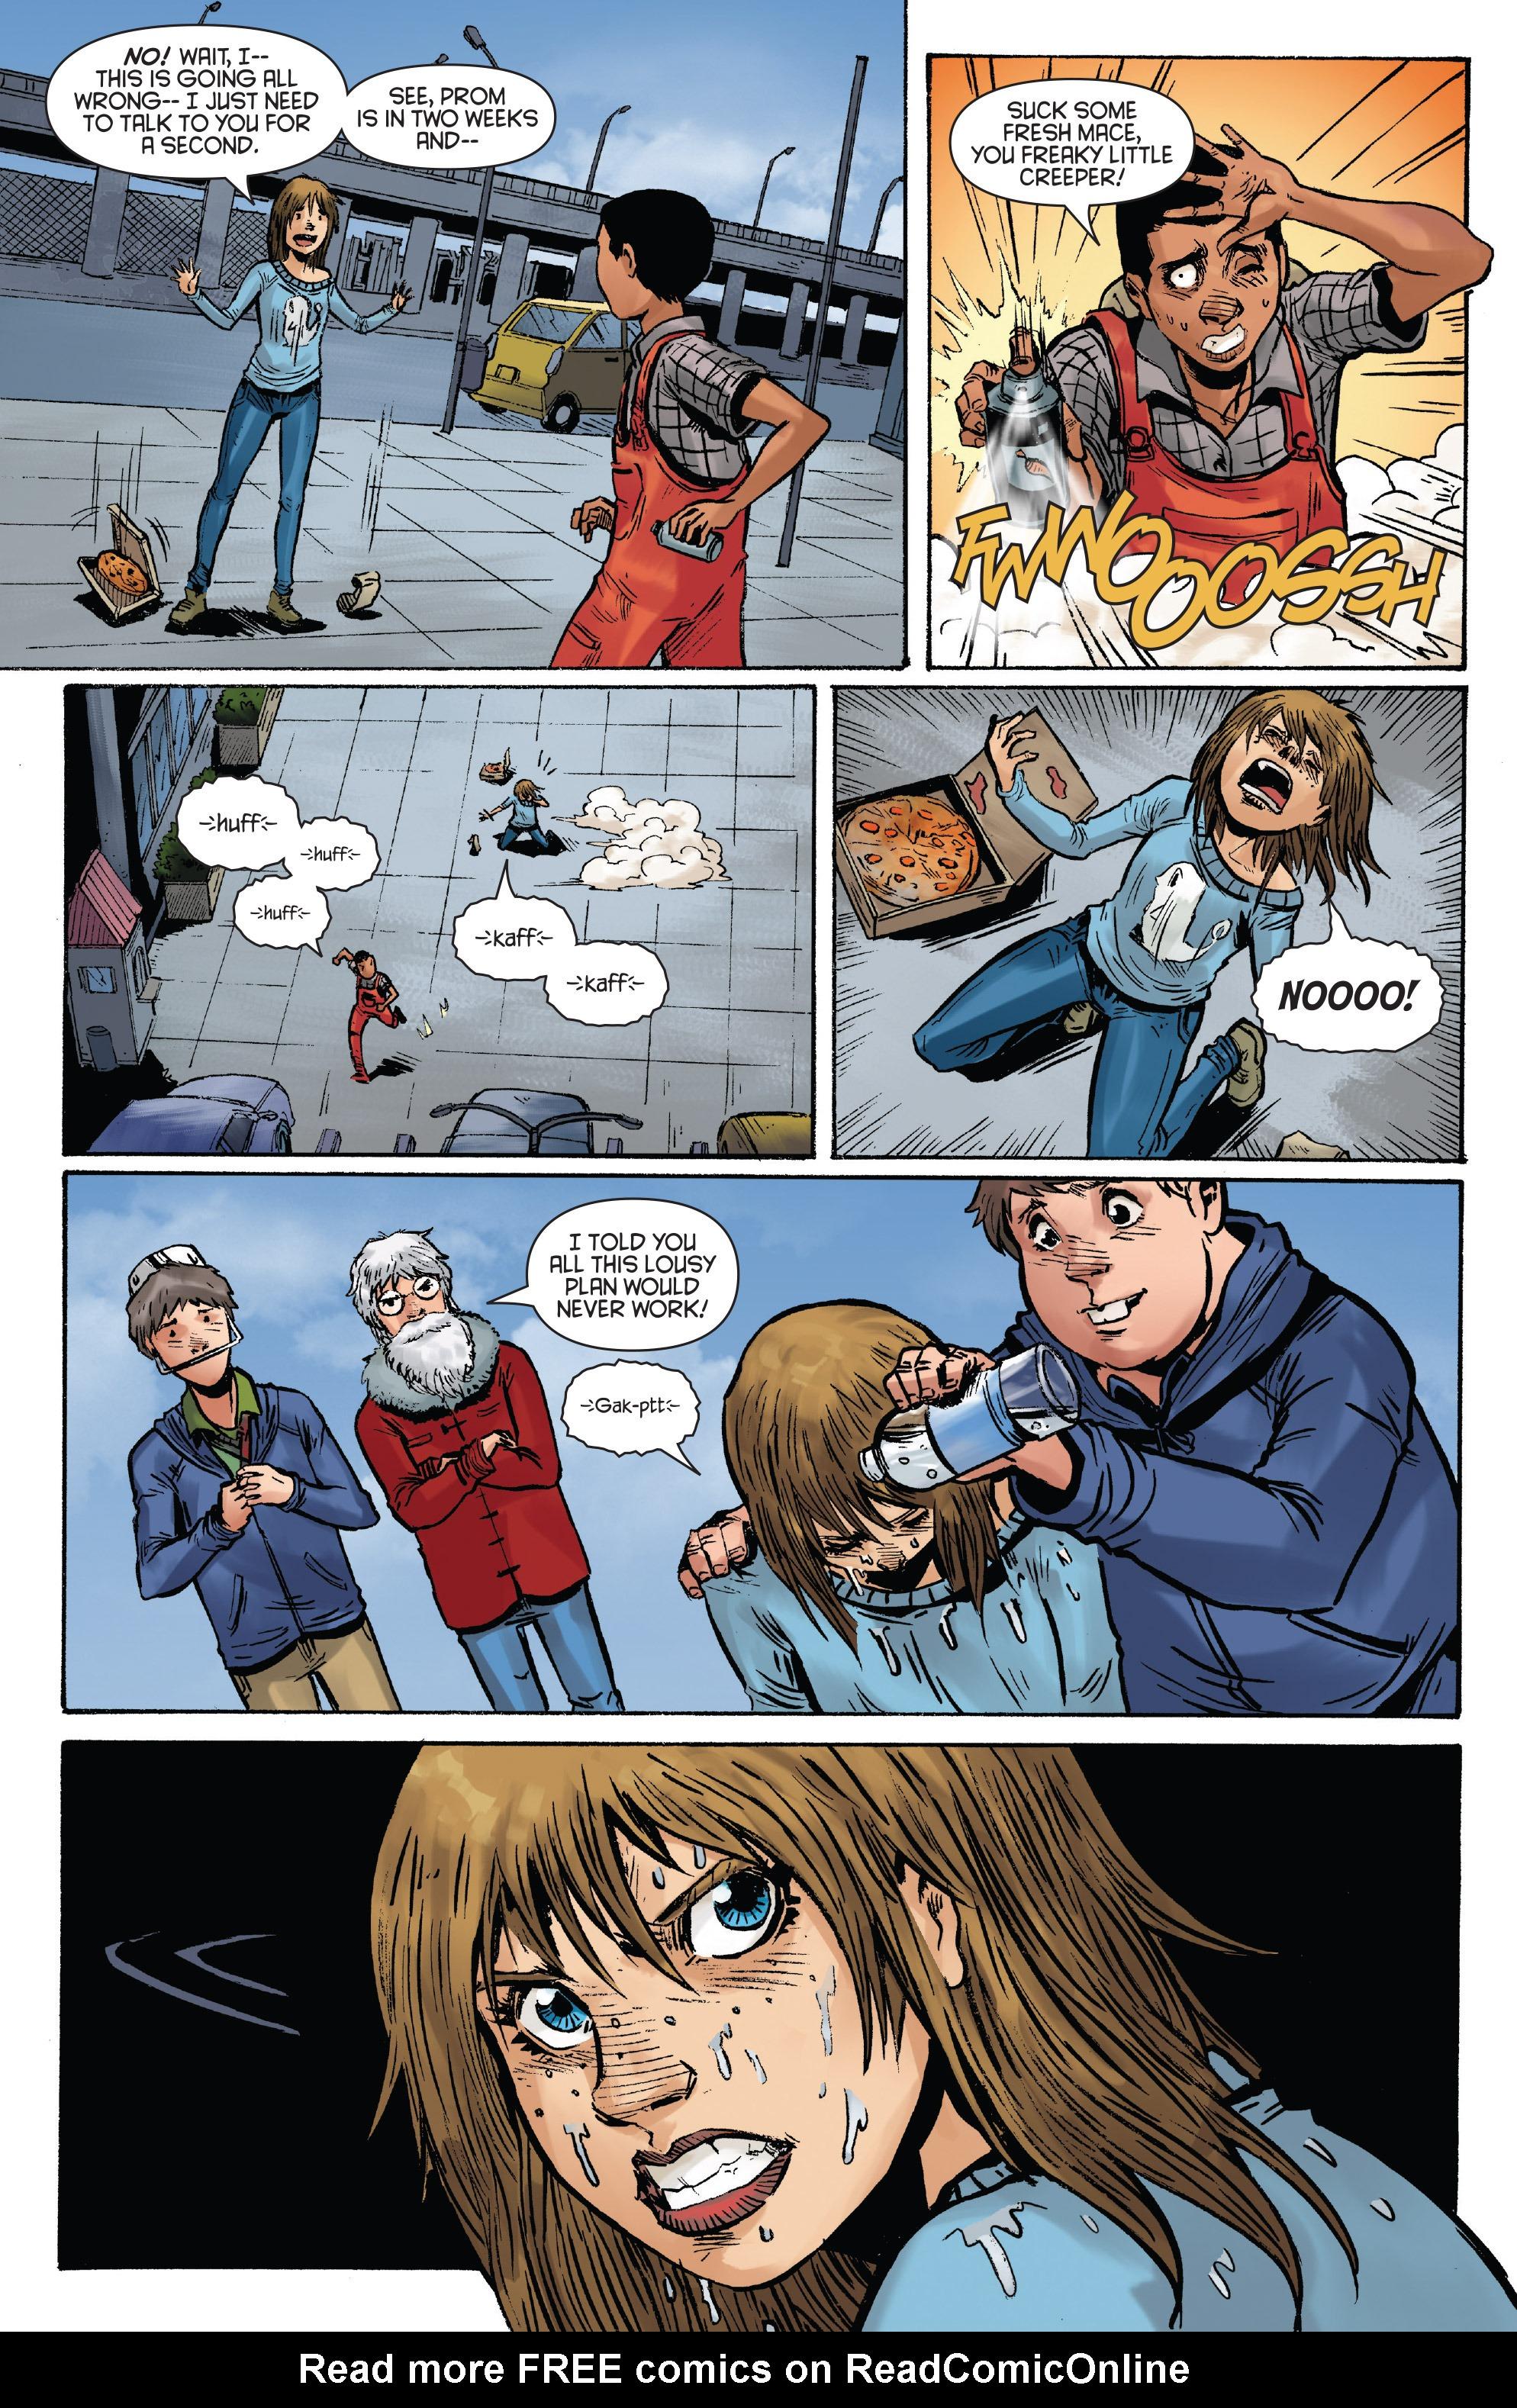 Read online Smosh comic -  Issue #2 - 13